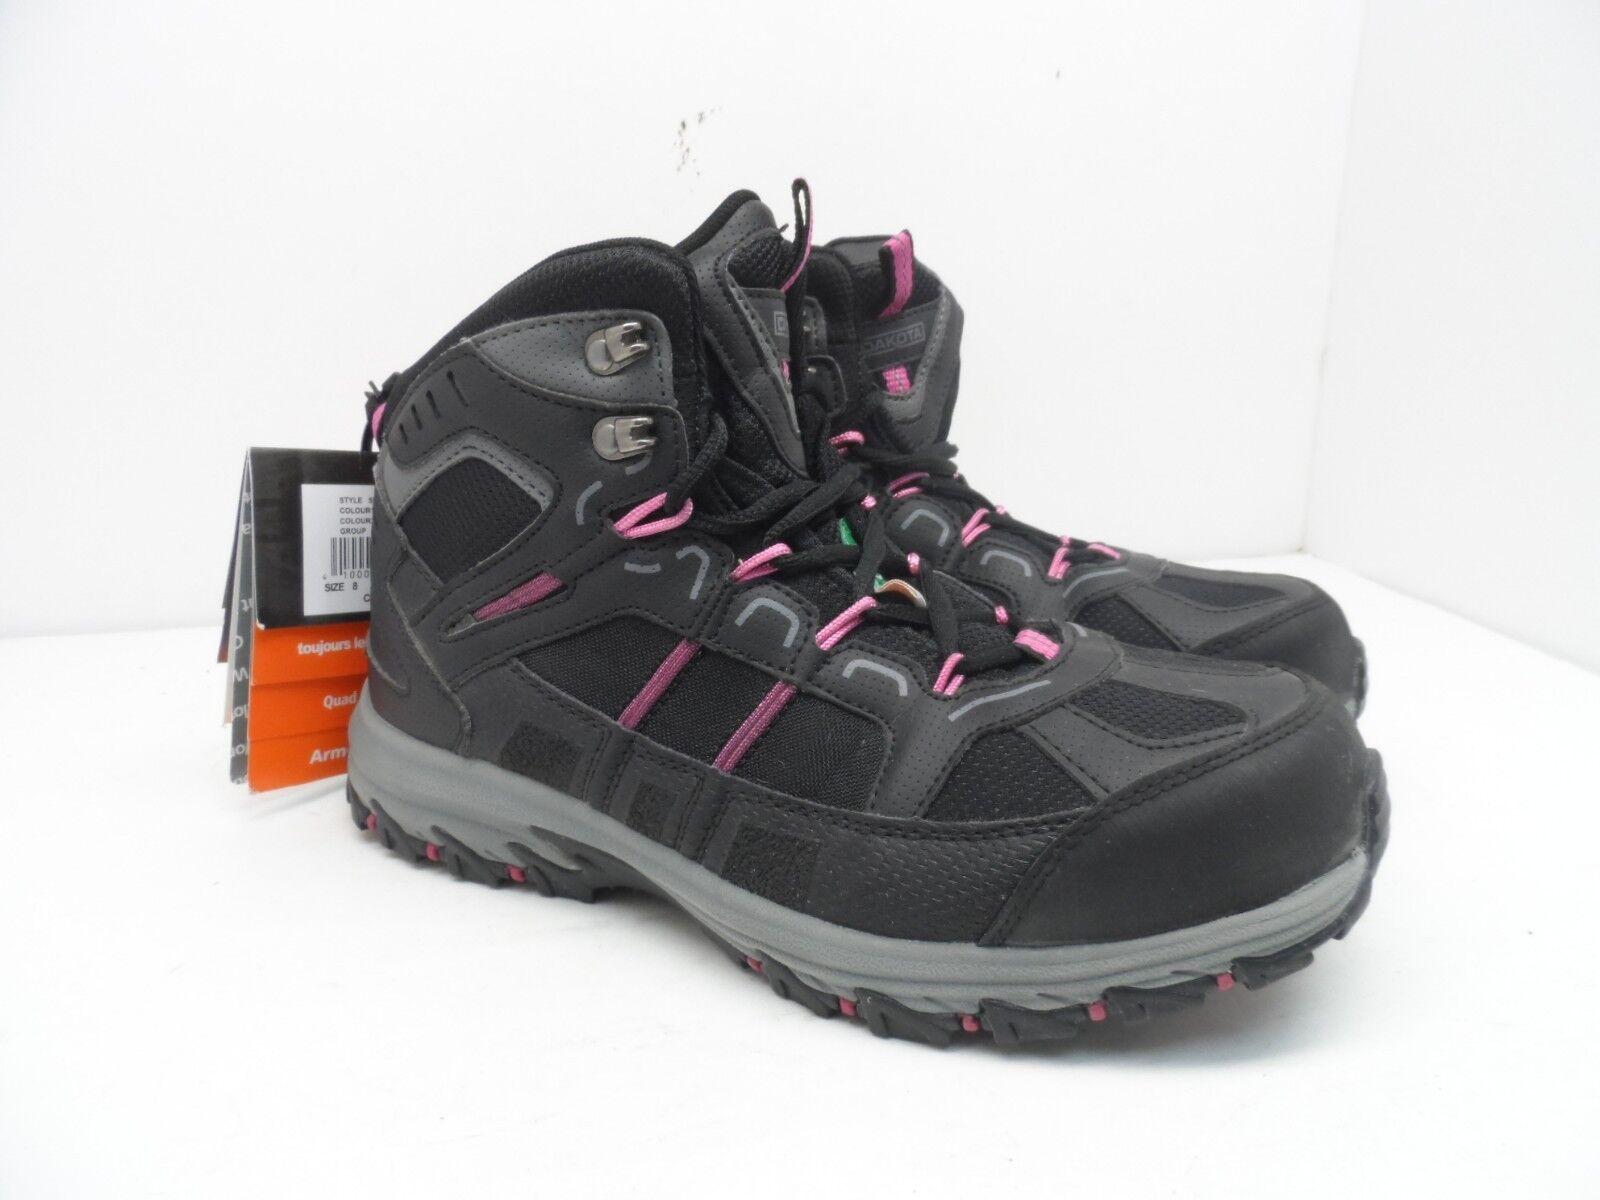 DAKOTA Women's Mid-Cut Aluminium Toe Composite Plate Work Boots Size 8EE